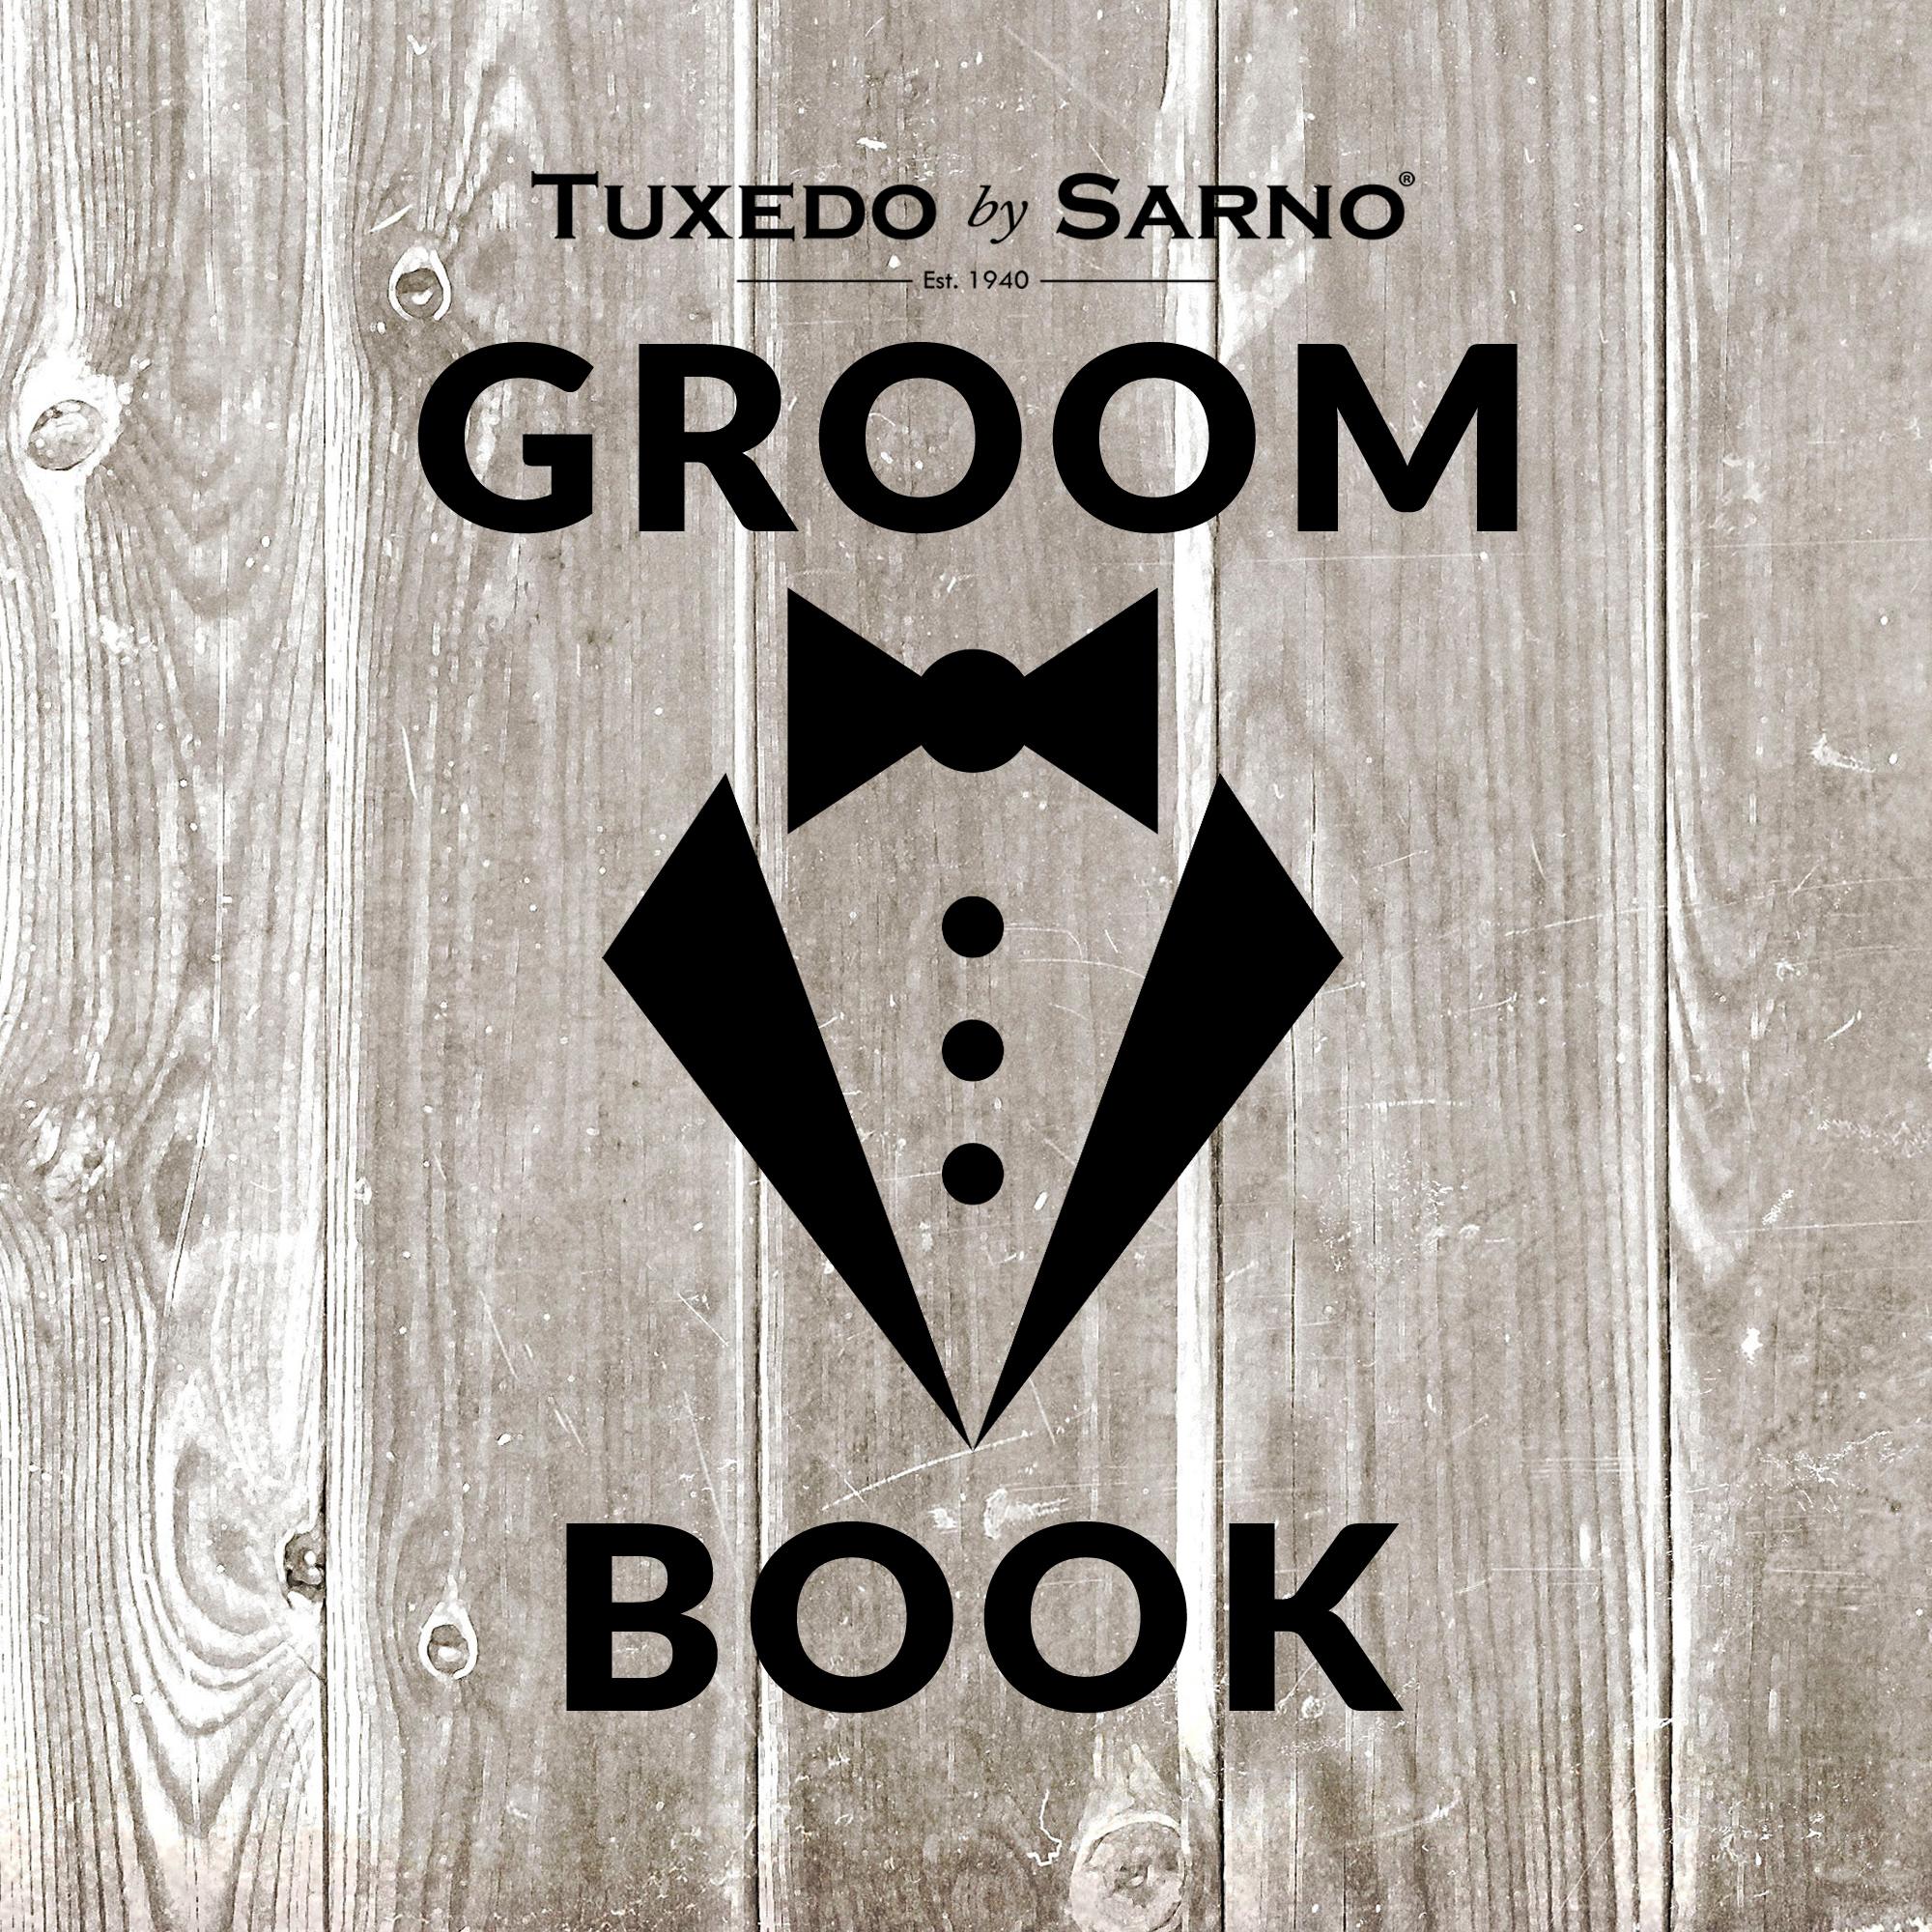 Tuxedo by Sarno - Groom Book